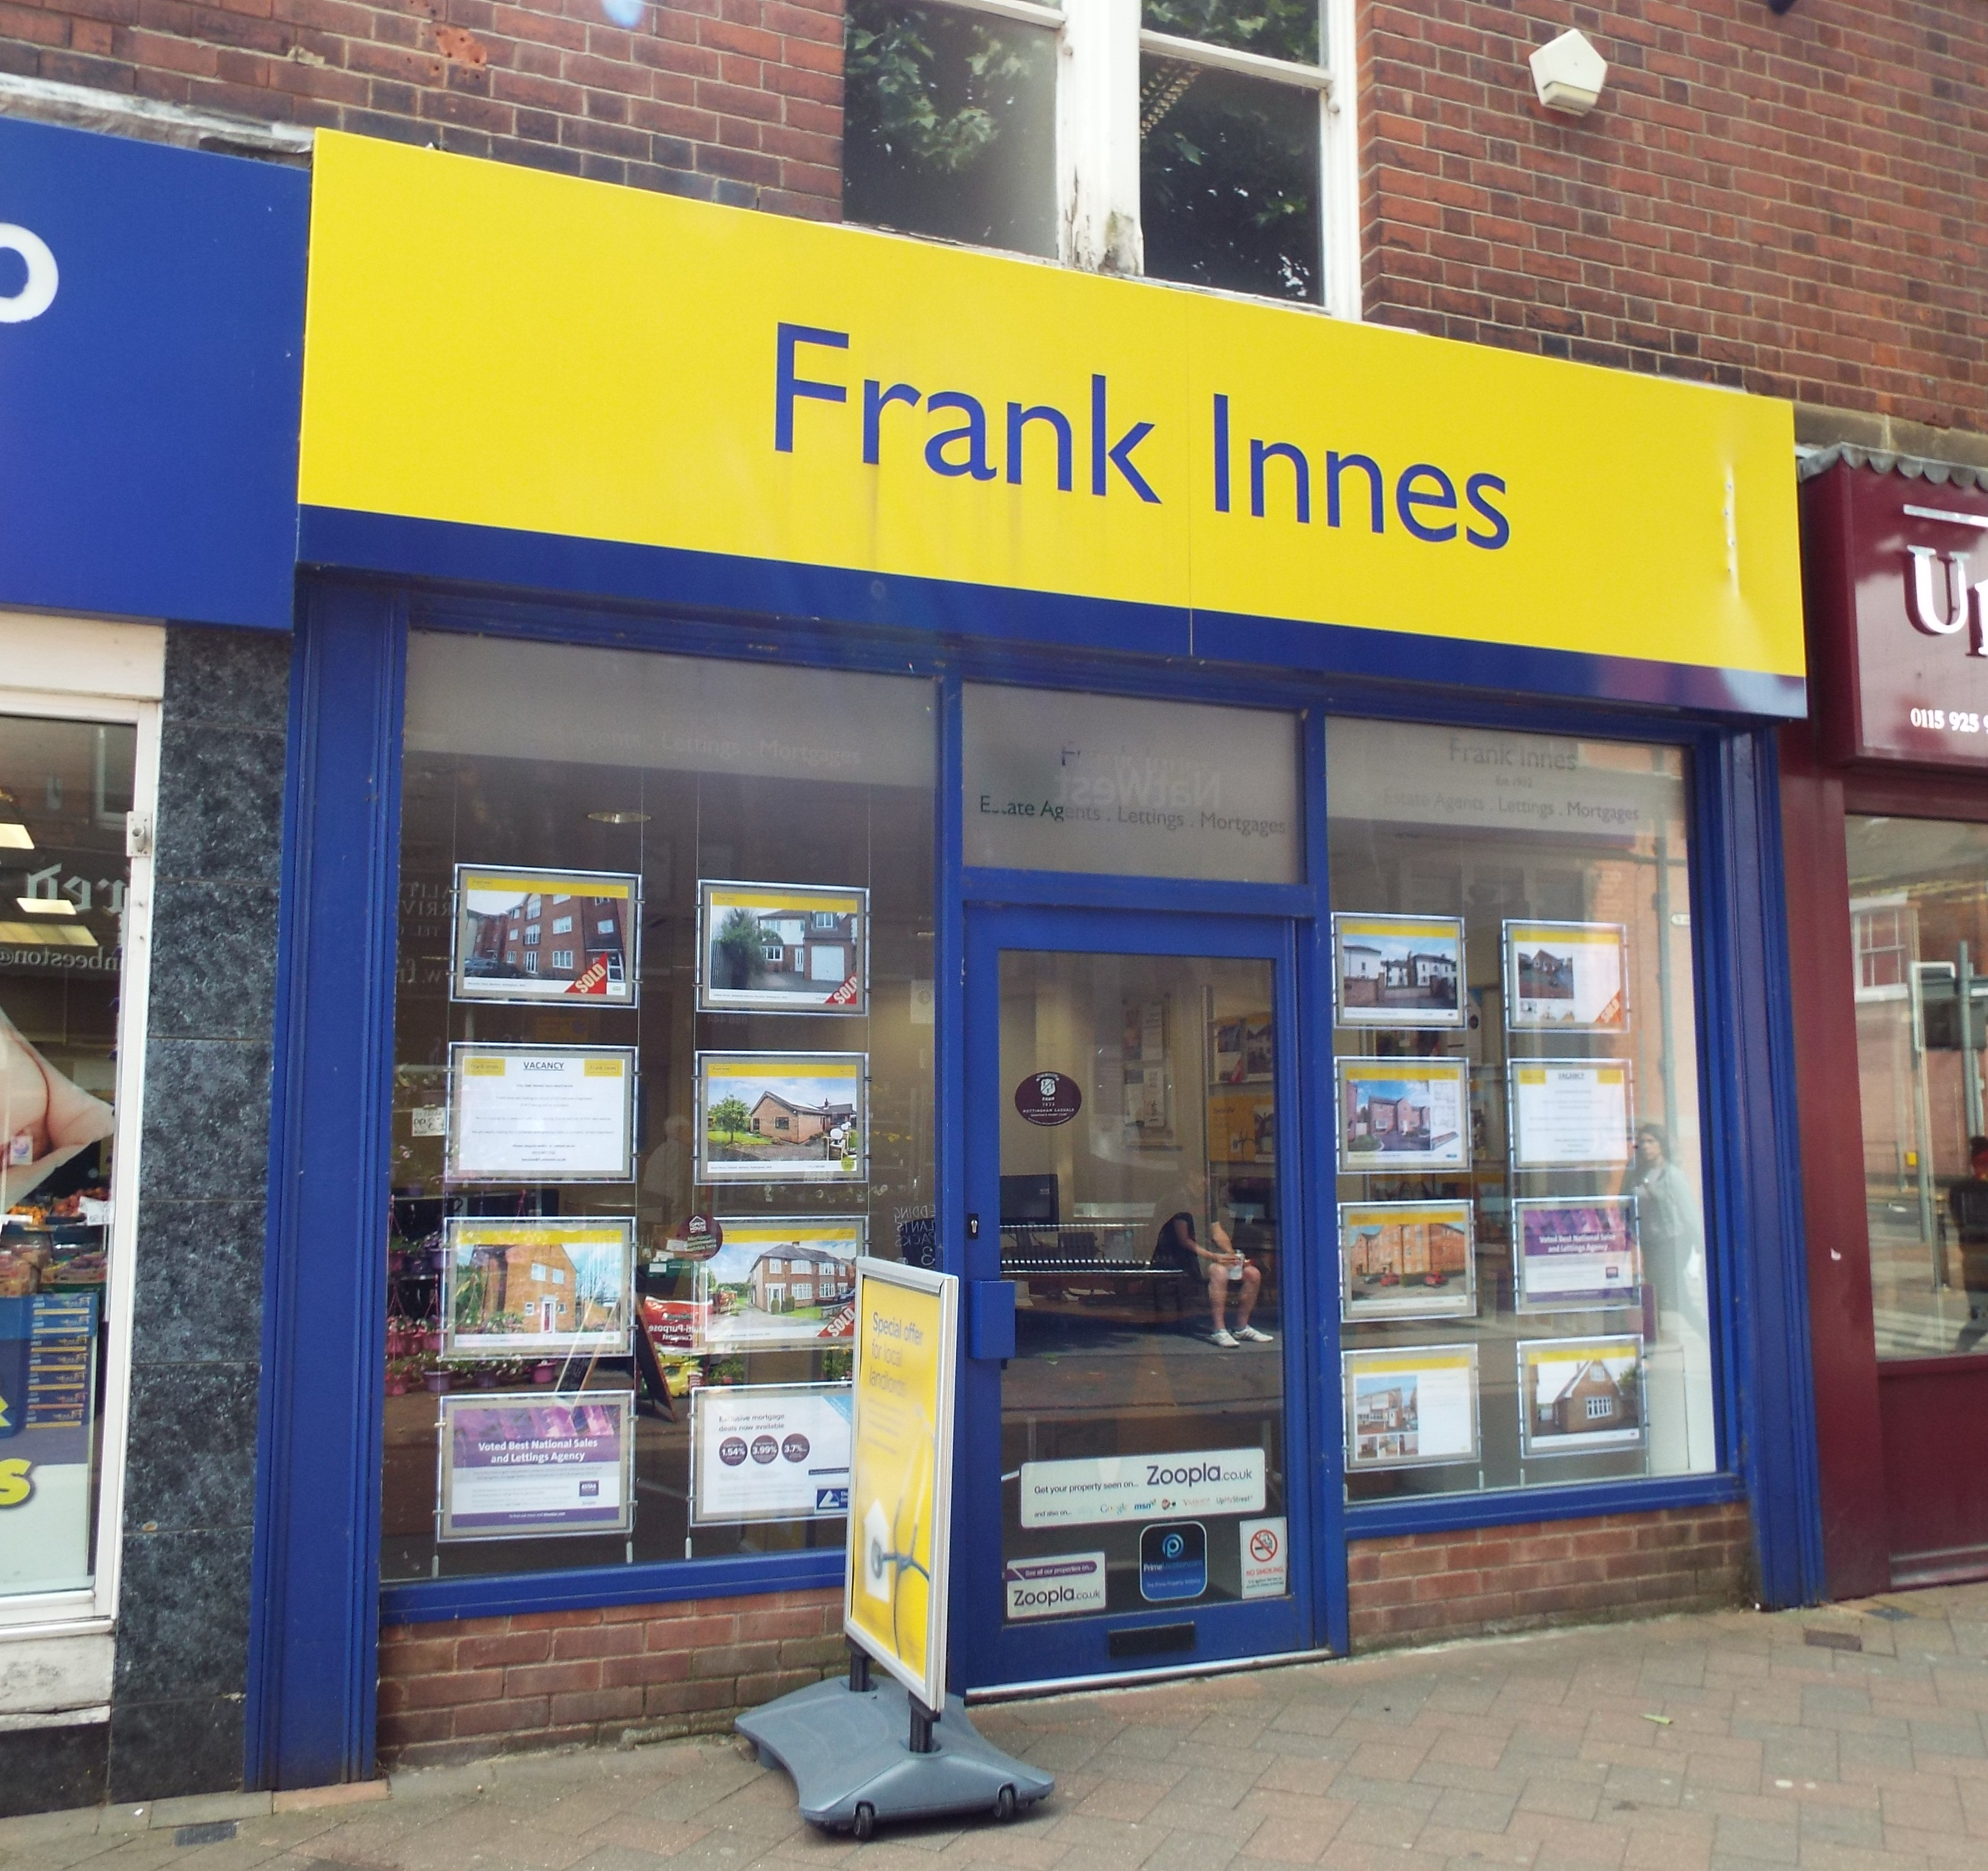 Frank Innes Estate Agents Beeston